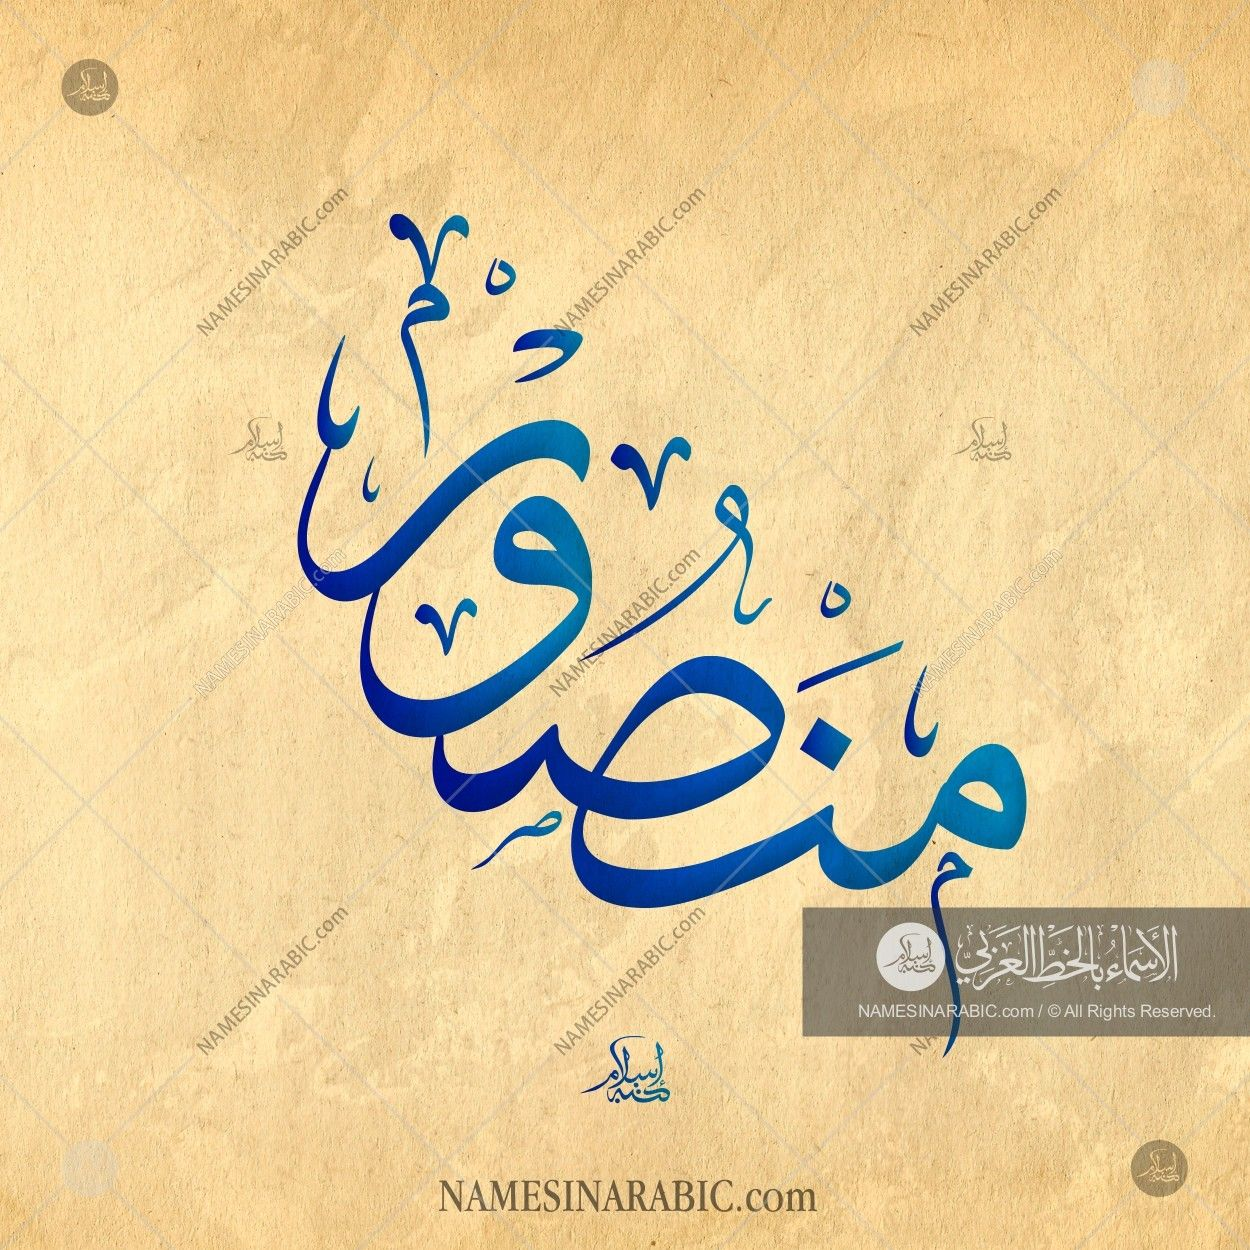 Mansur منصور Names In Arabic Calligraphy Name 6690 Calligraphy Name Calligraphy Islamic Art Calligraphy